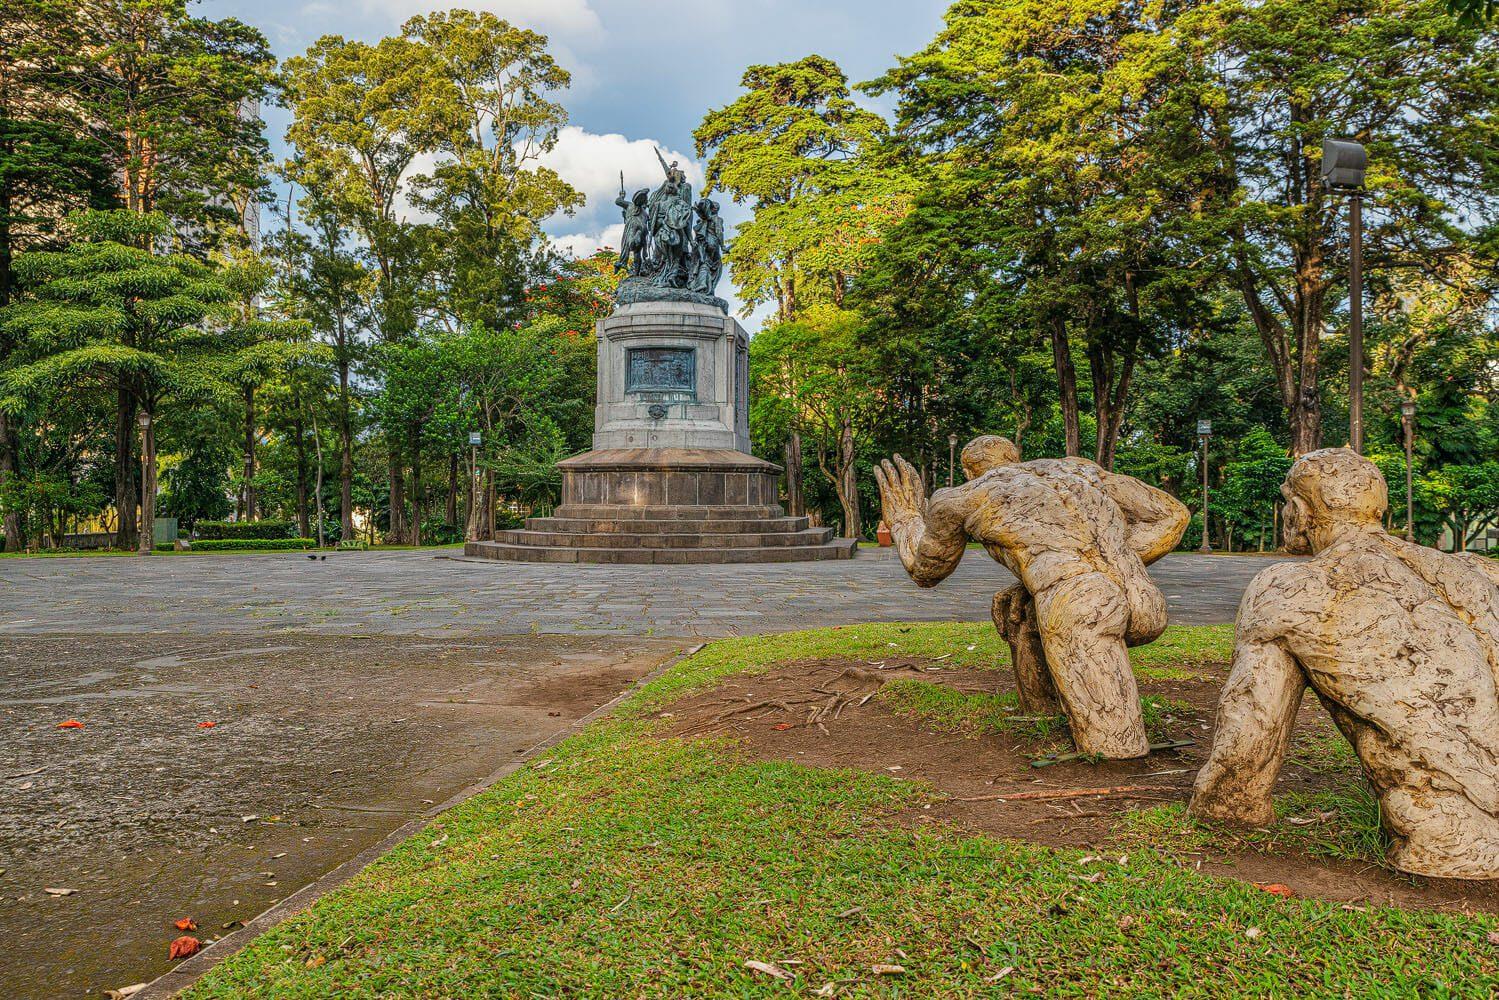 Sculpture Nuevo Paradigma and statue of the Battle of Rivas. Parque nacional San Jose